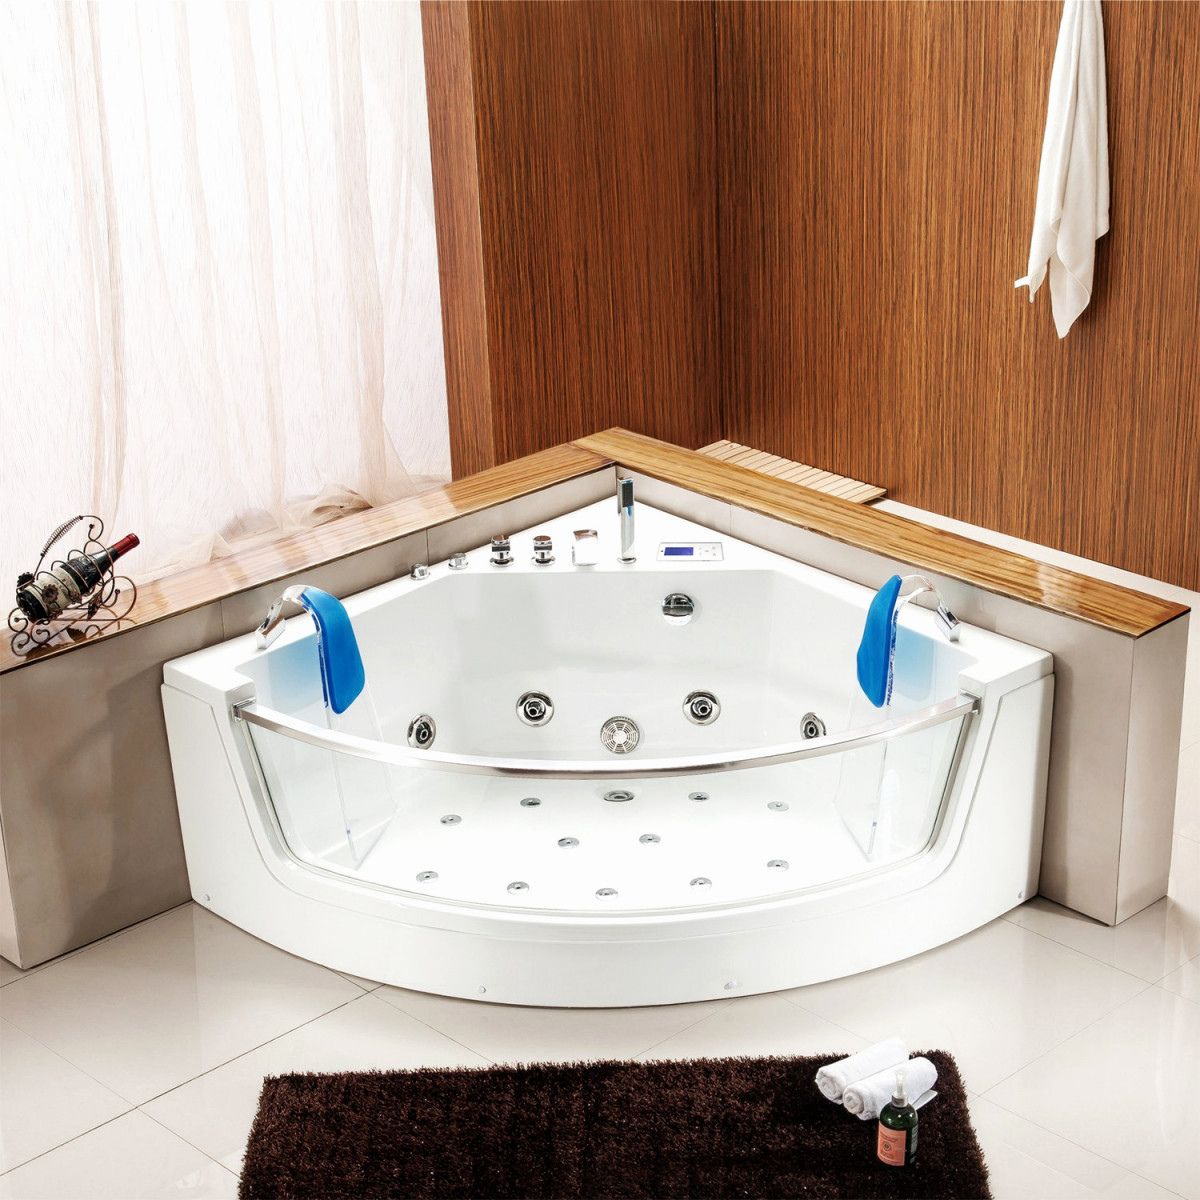 201 Baignoire Douche Avec Porte Pas Cher 2020 Corner Bathtub Bathroom Bathtub